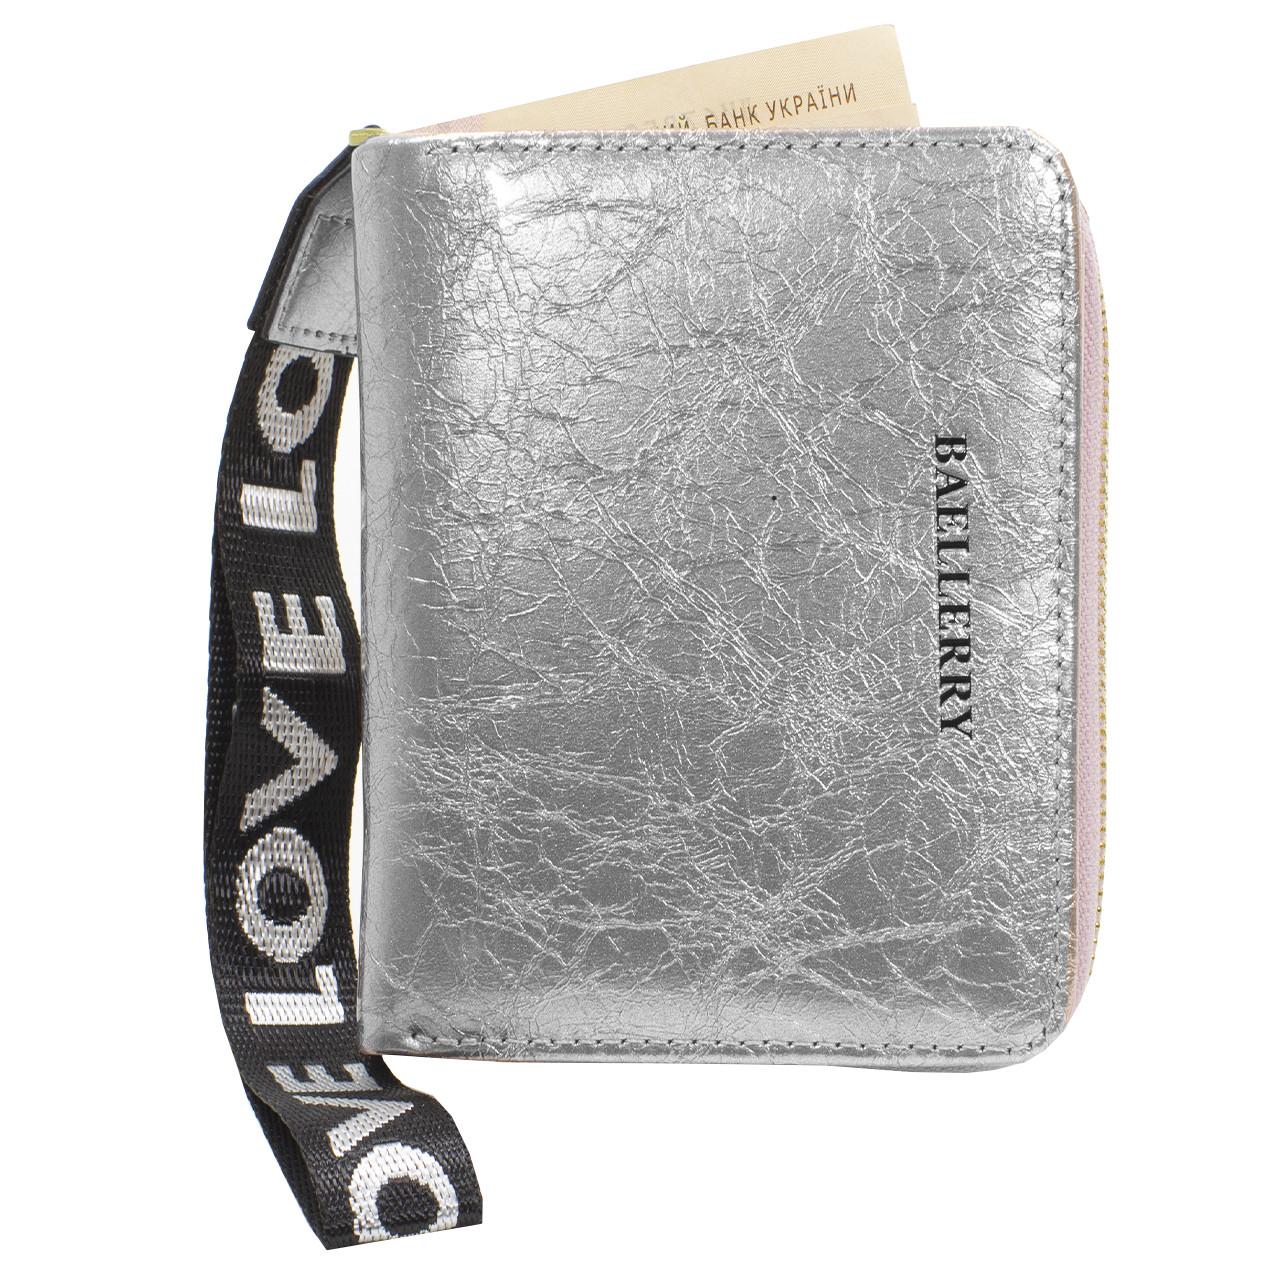 Жіночий гаманець Baellerry DR022 Silver з ремінцем (3544-10241)